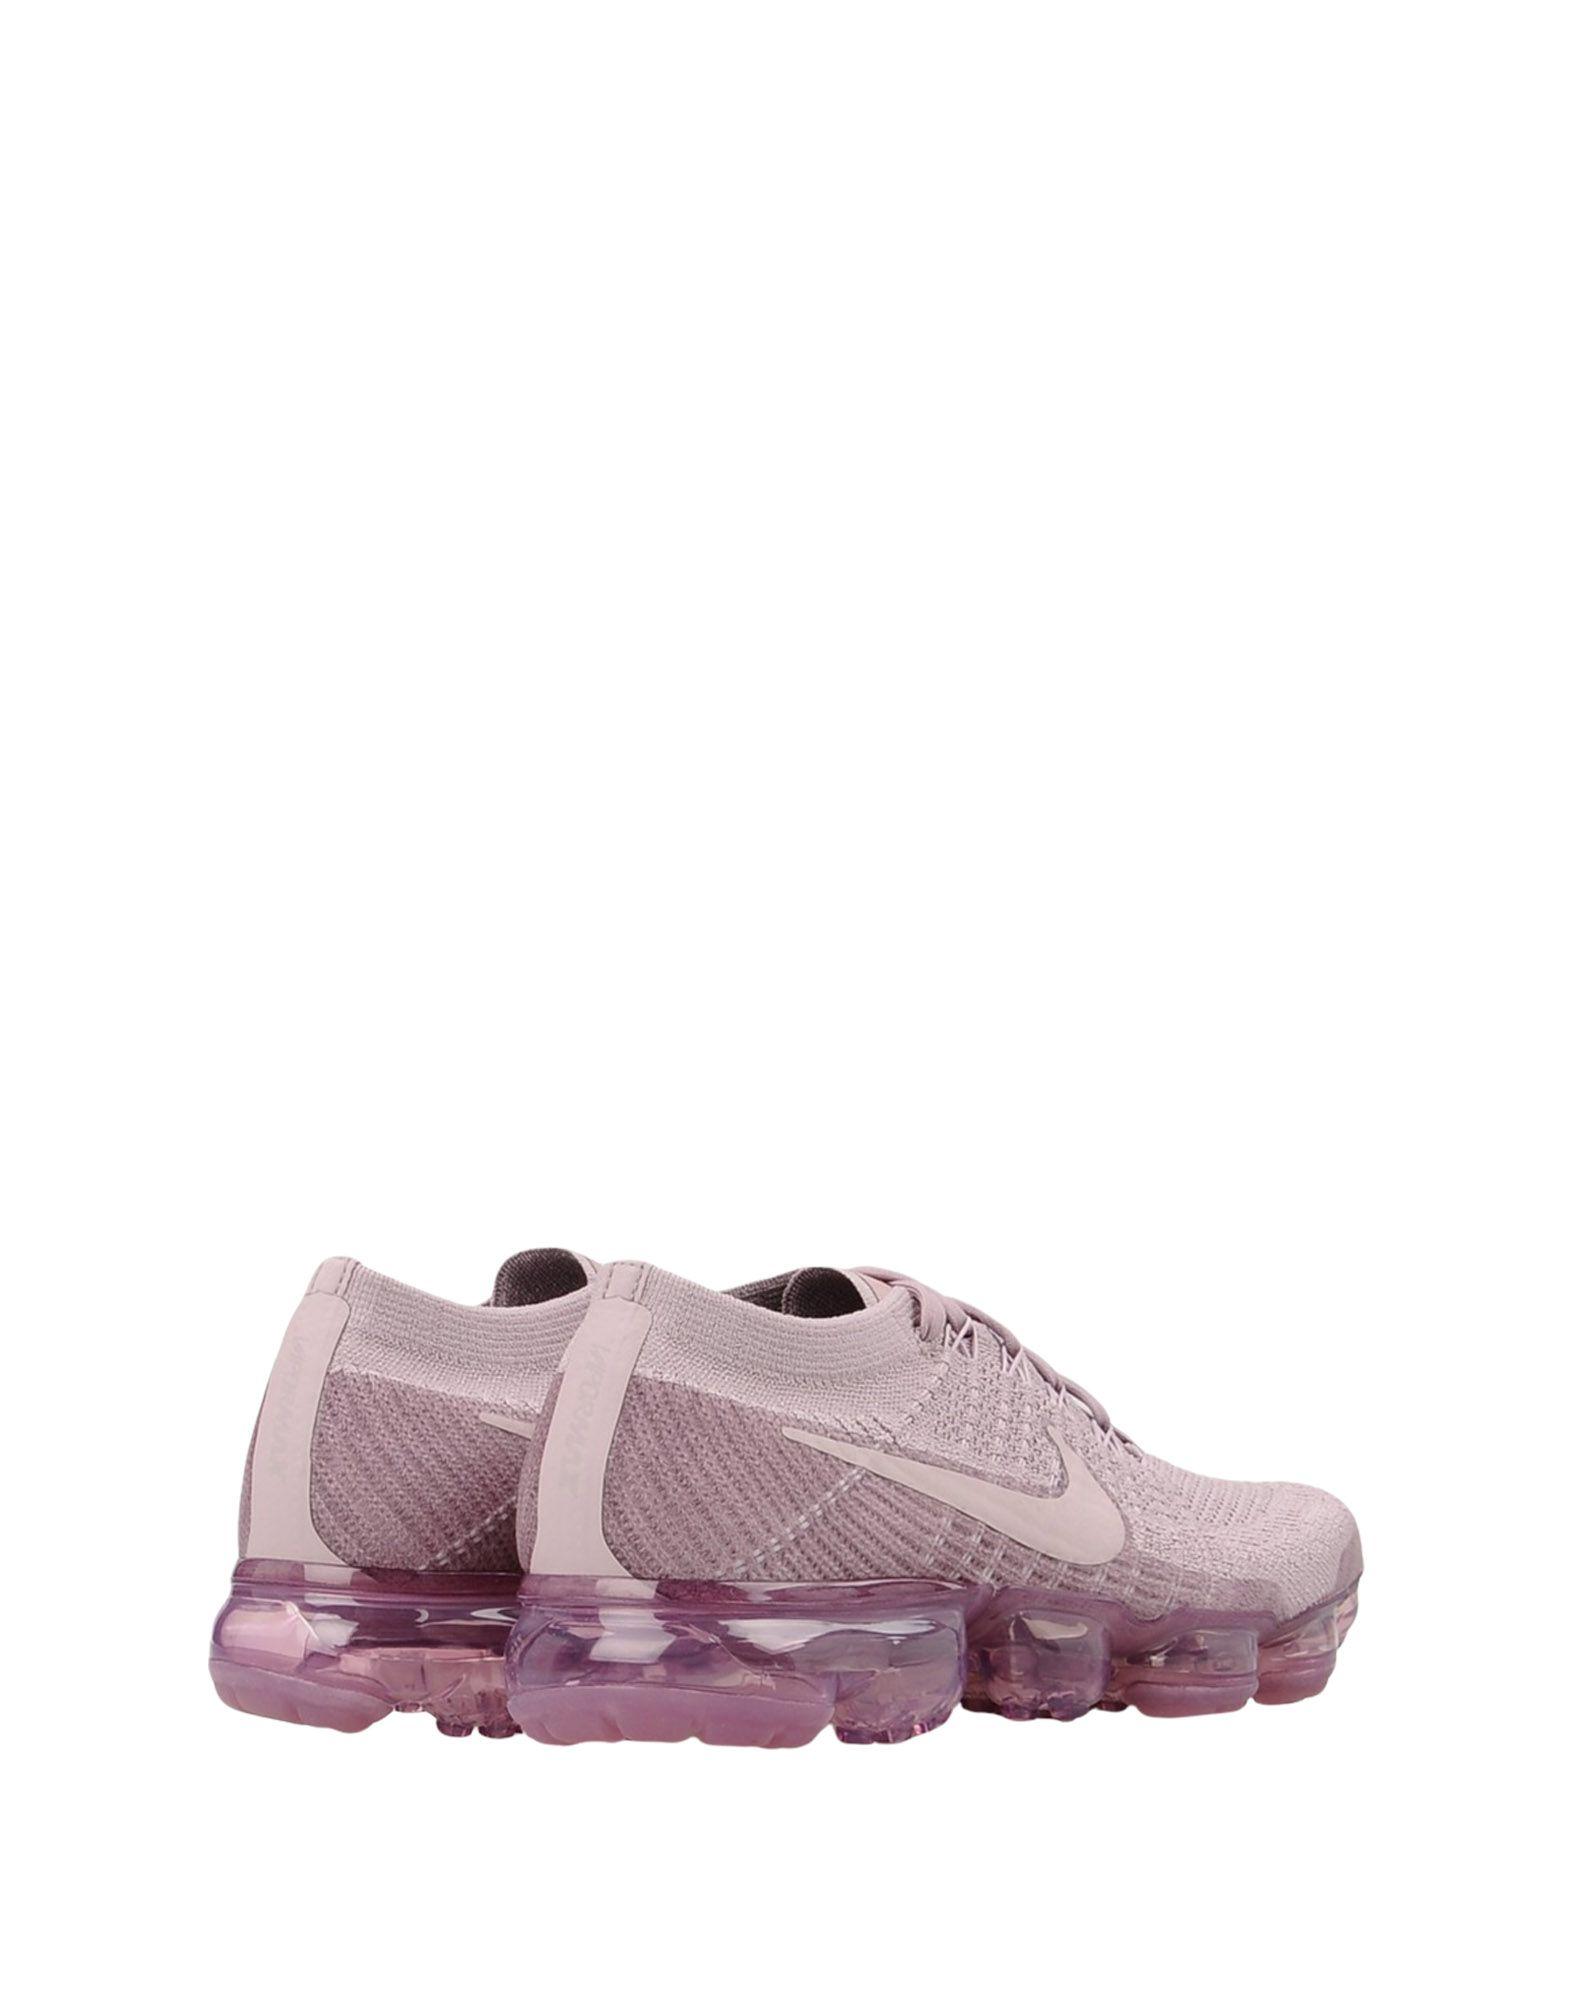 Sneakers Nike   Air Vapormax Flyknit - Femme - Sneakers Nike sur